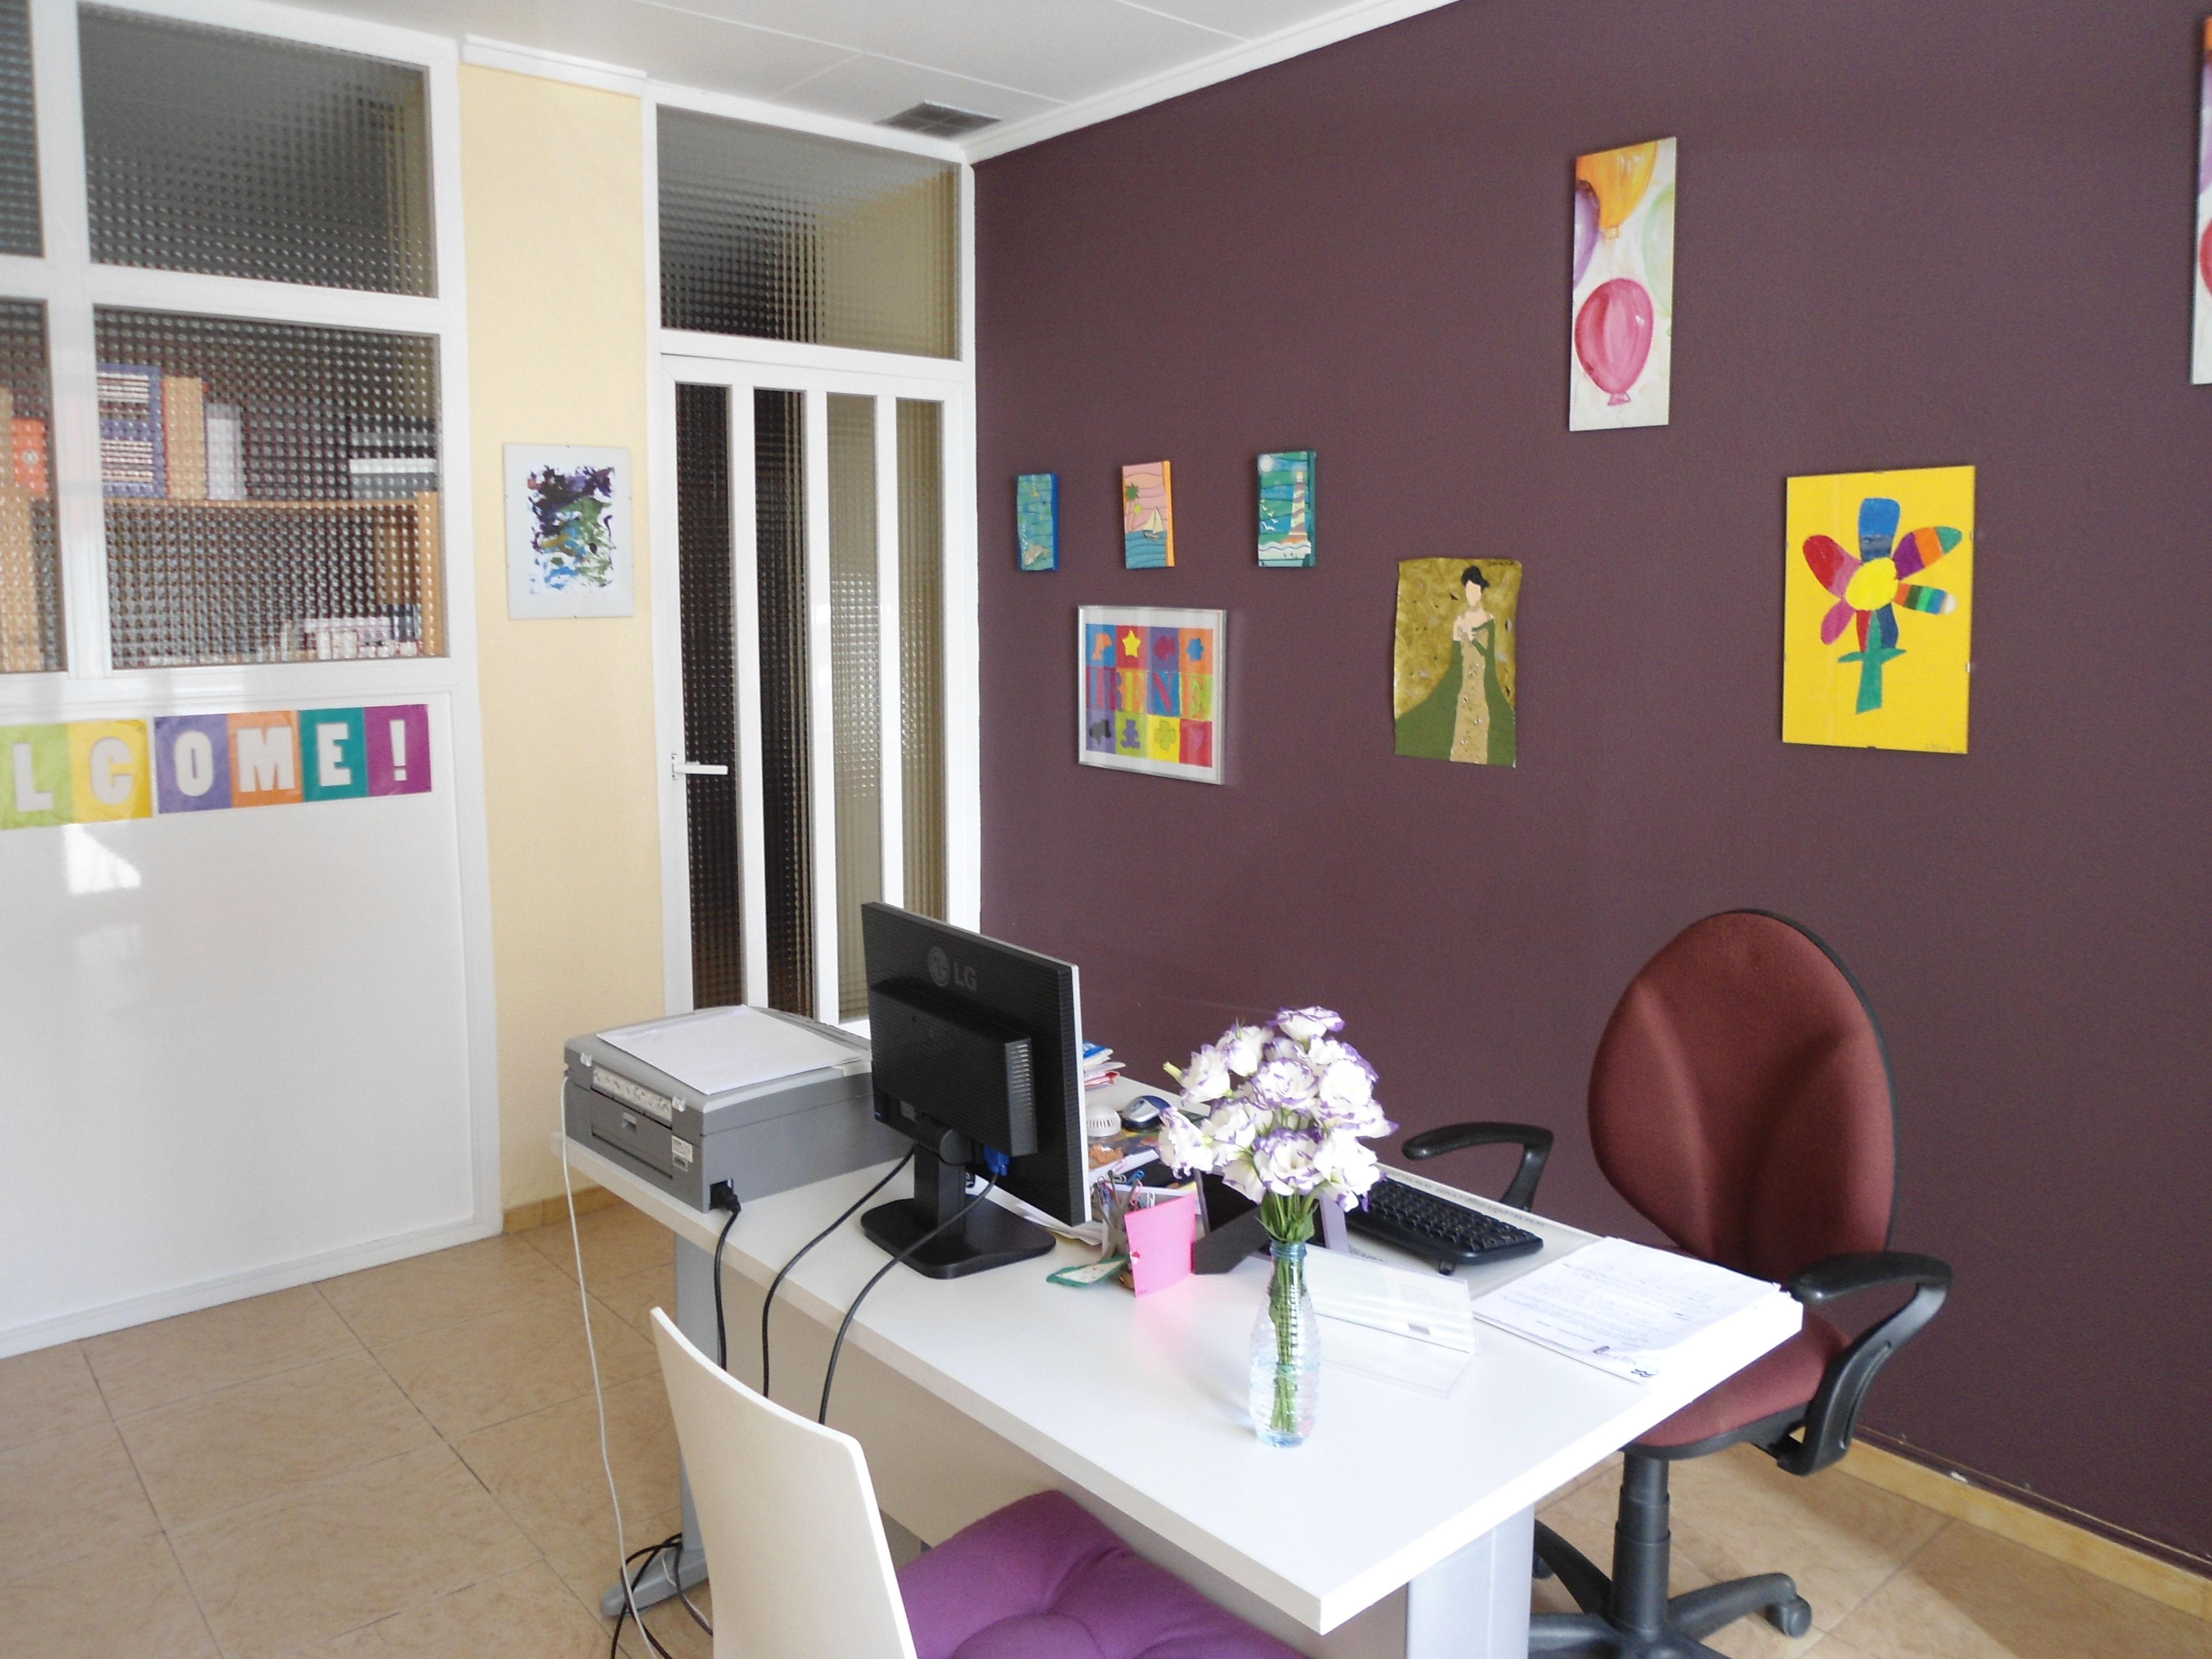 Foto 14 de Academias de idiomas en Moncada | Centre d'Estudis Etnies